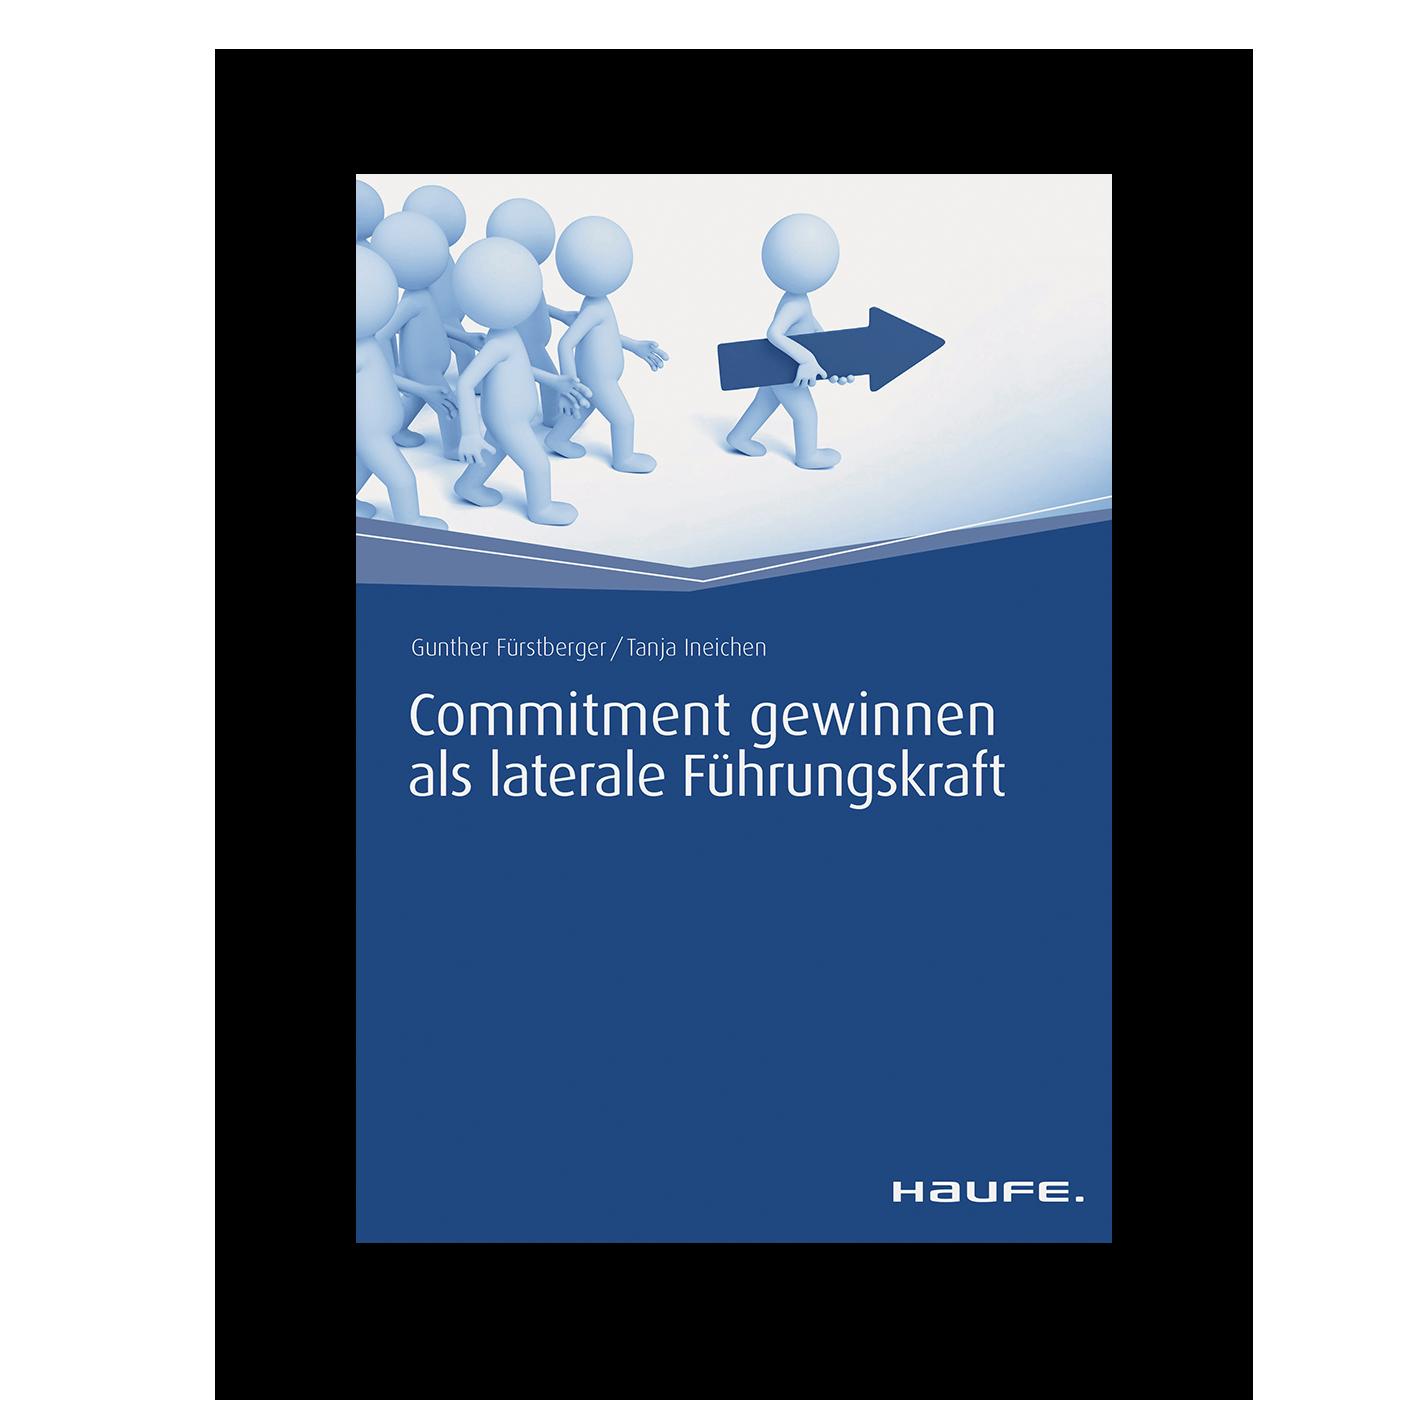 Commitment gewinnen als laterale Führungskraft - Fachbuch